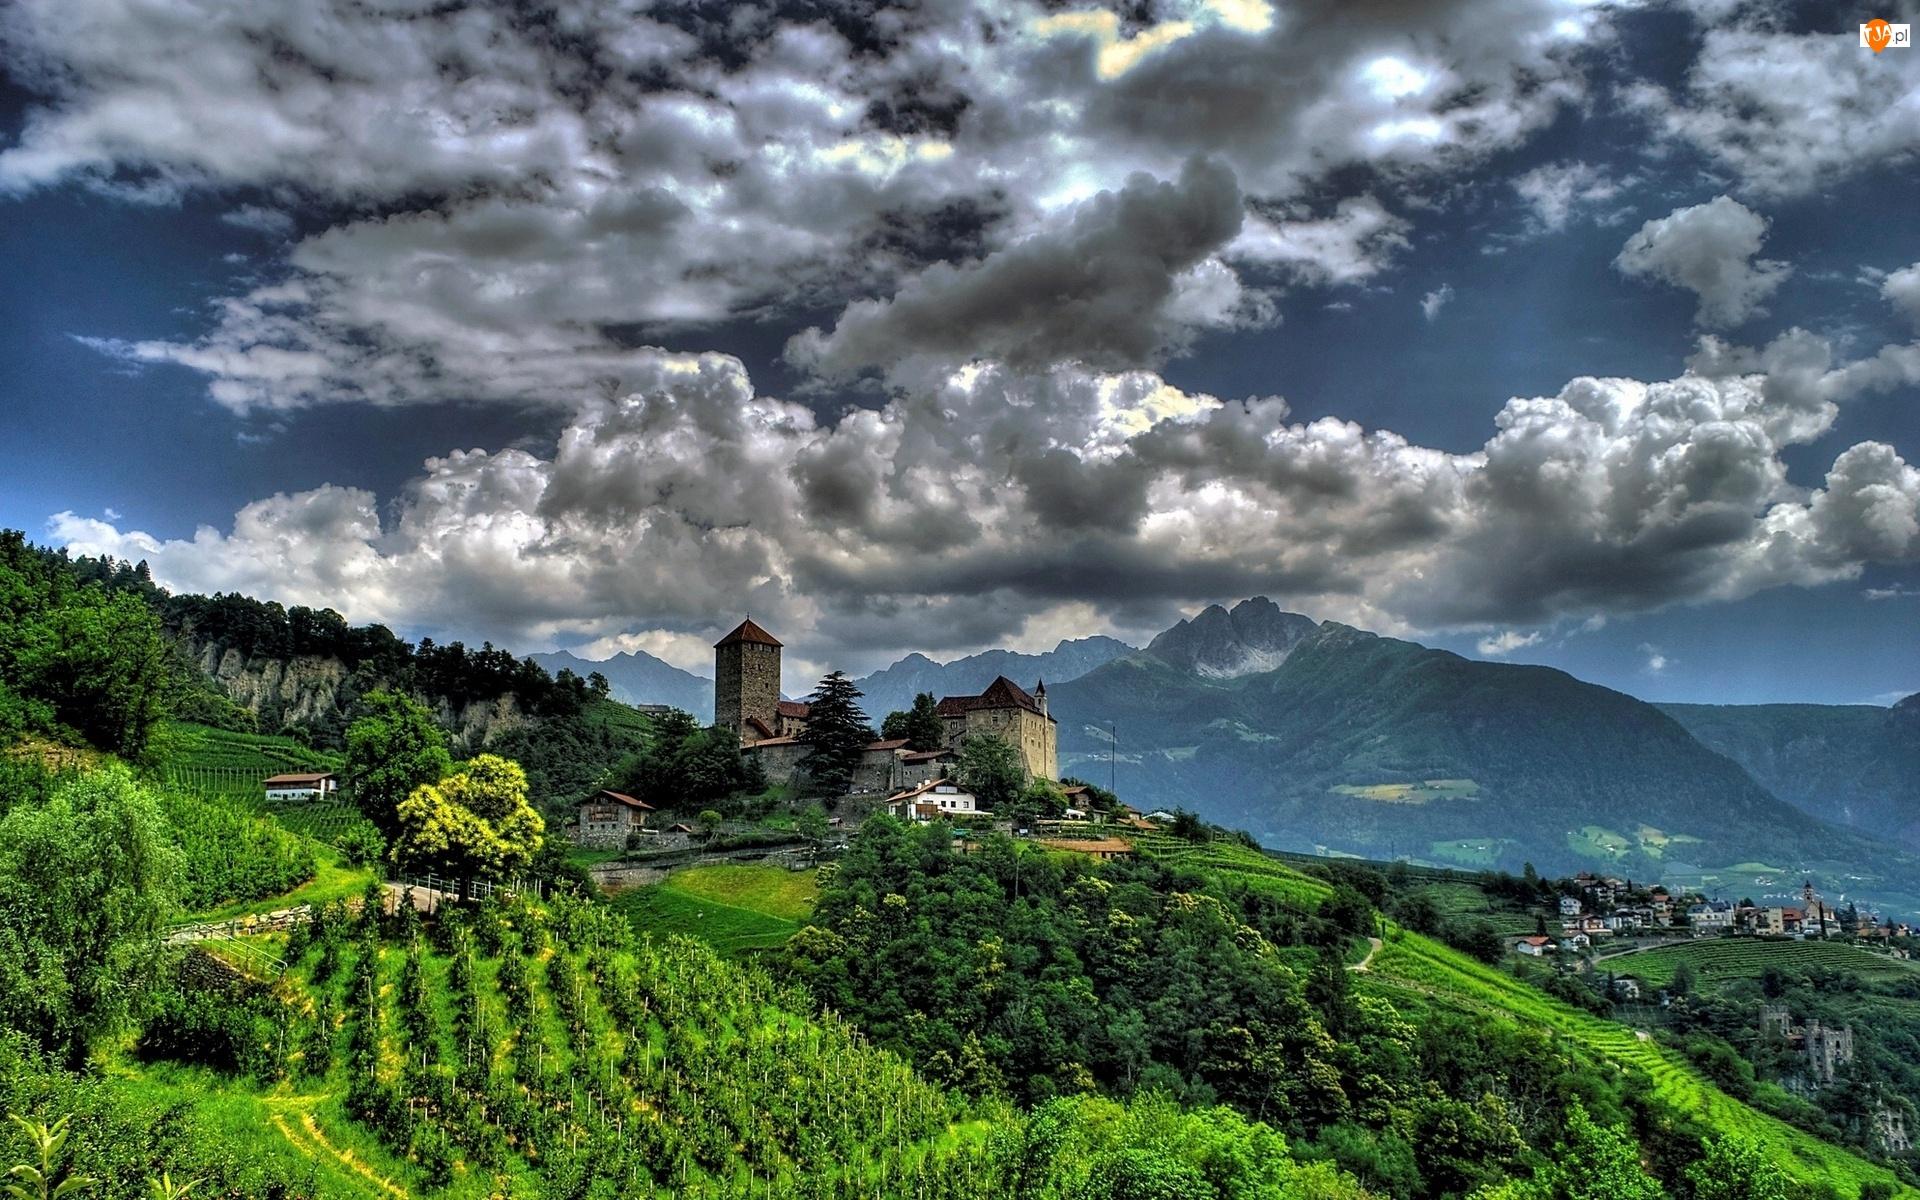 Góry, Chmury, Łąki, Tyrol, Wioska, Austria, Pola, Południowy